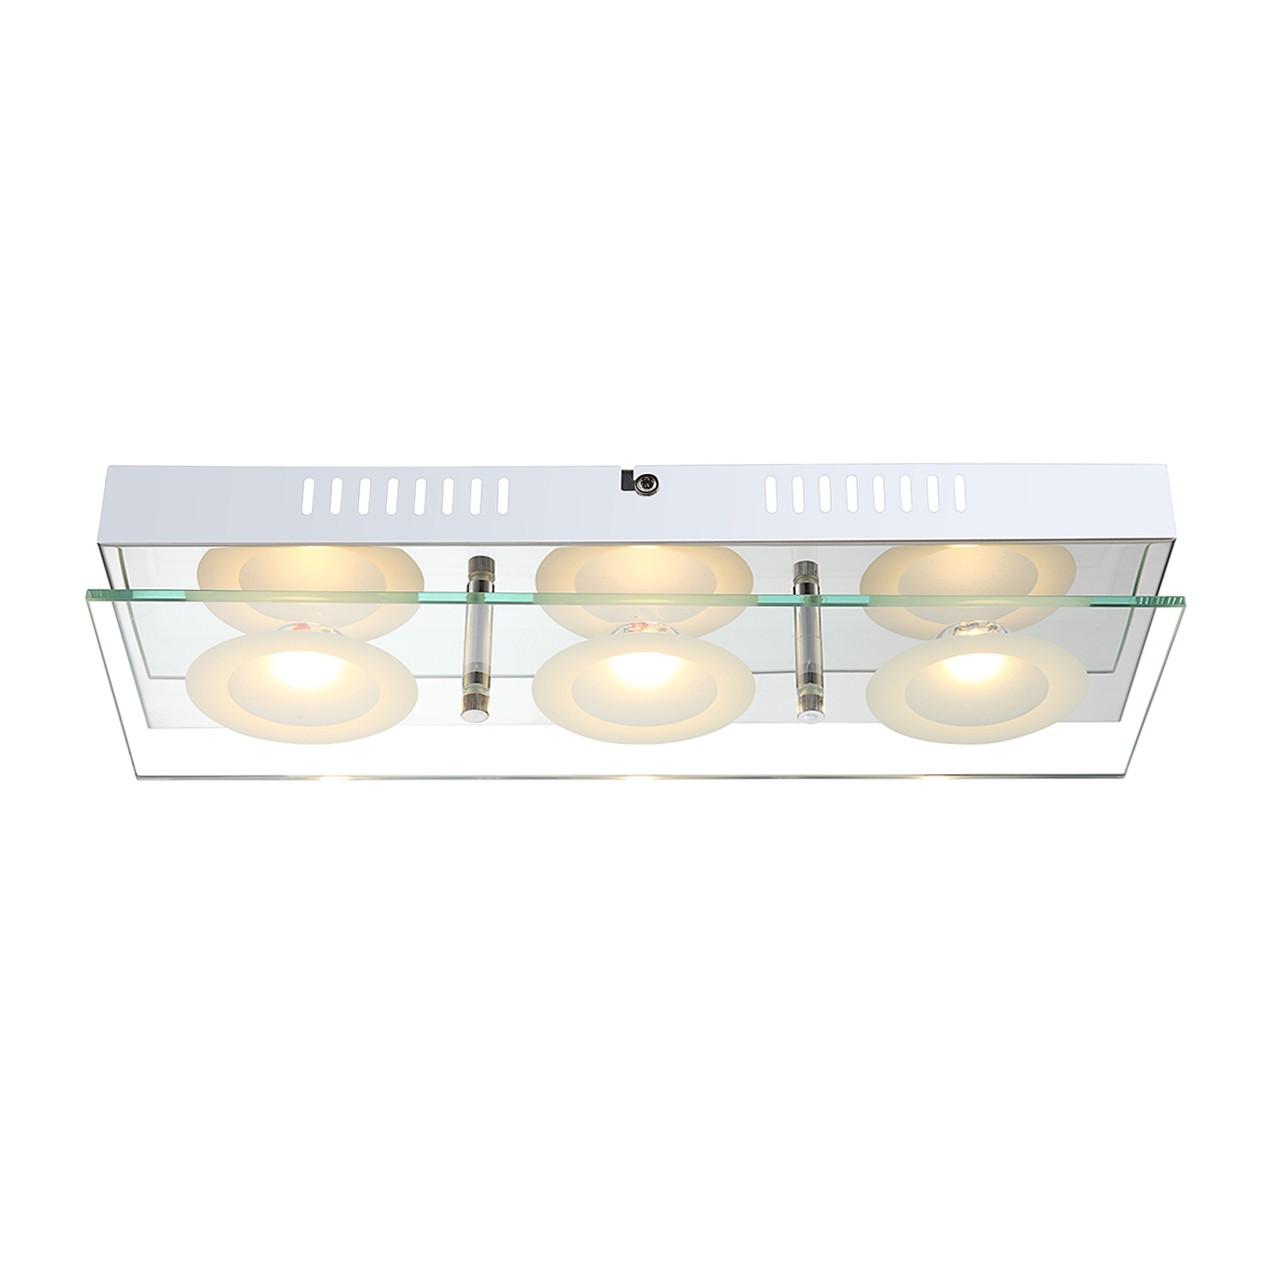 LED-Wandleuchte Oda 3-flammig